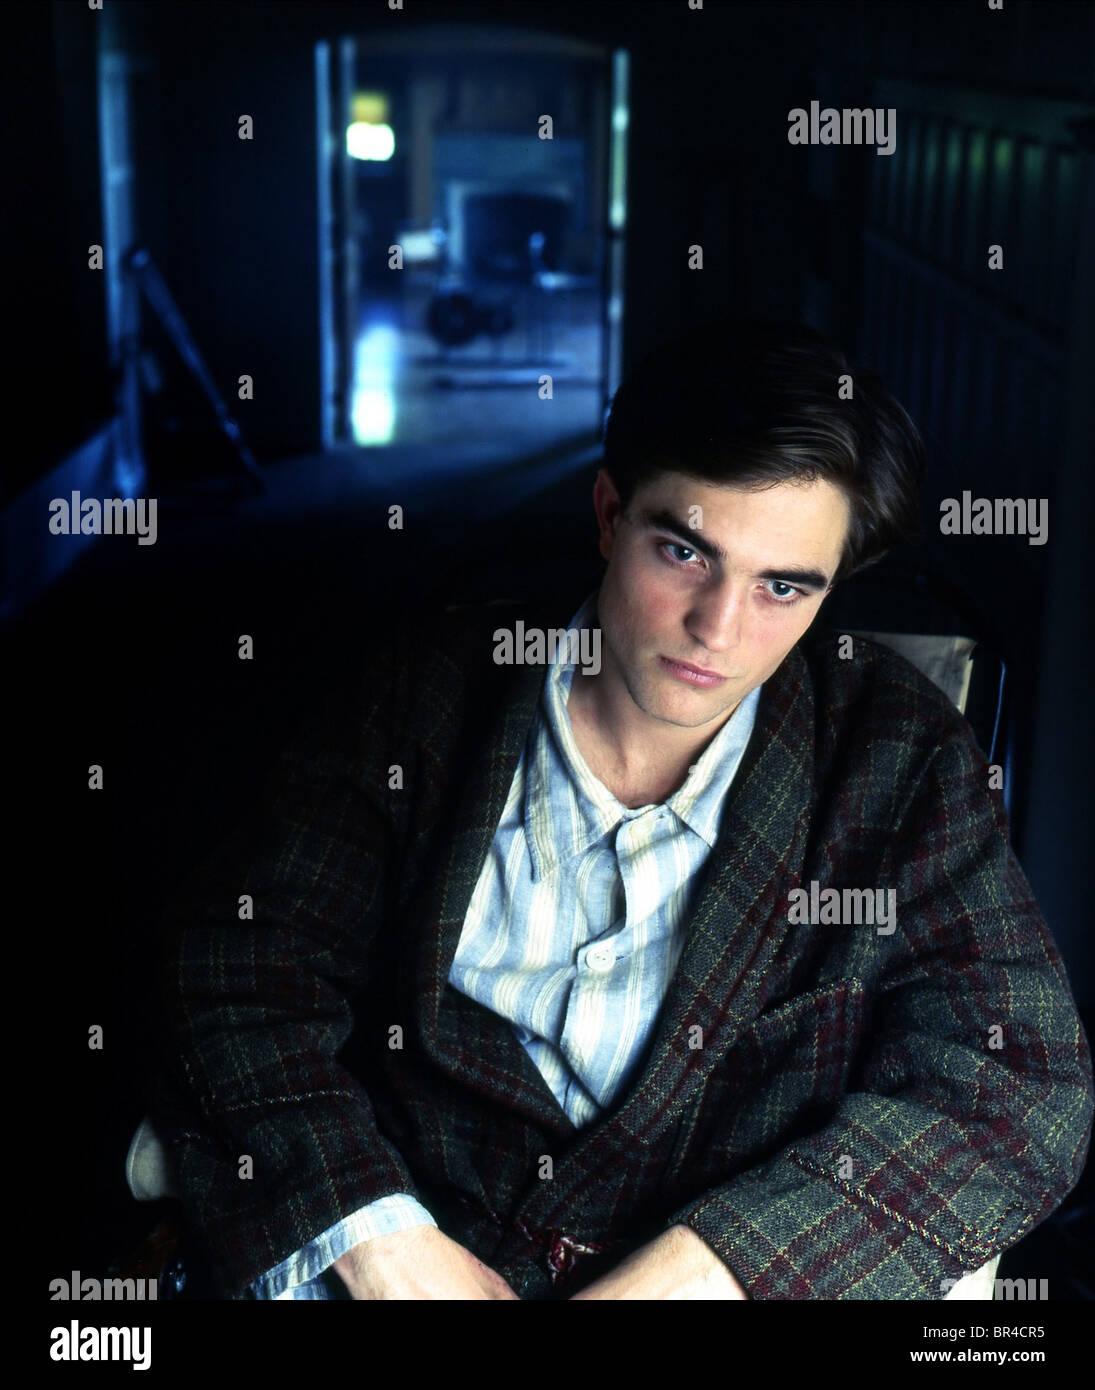 ROBERT PATTINSON THE HAUNTED AIRMAN (2006) - Stock Image